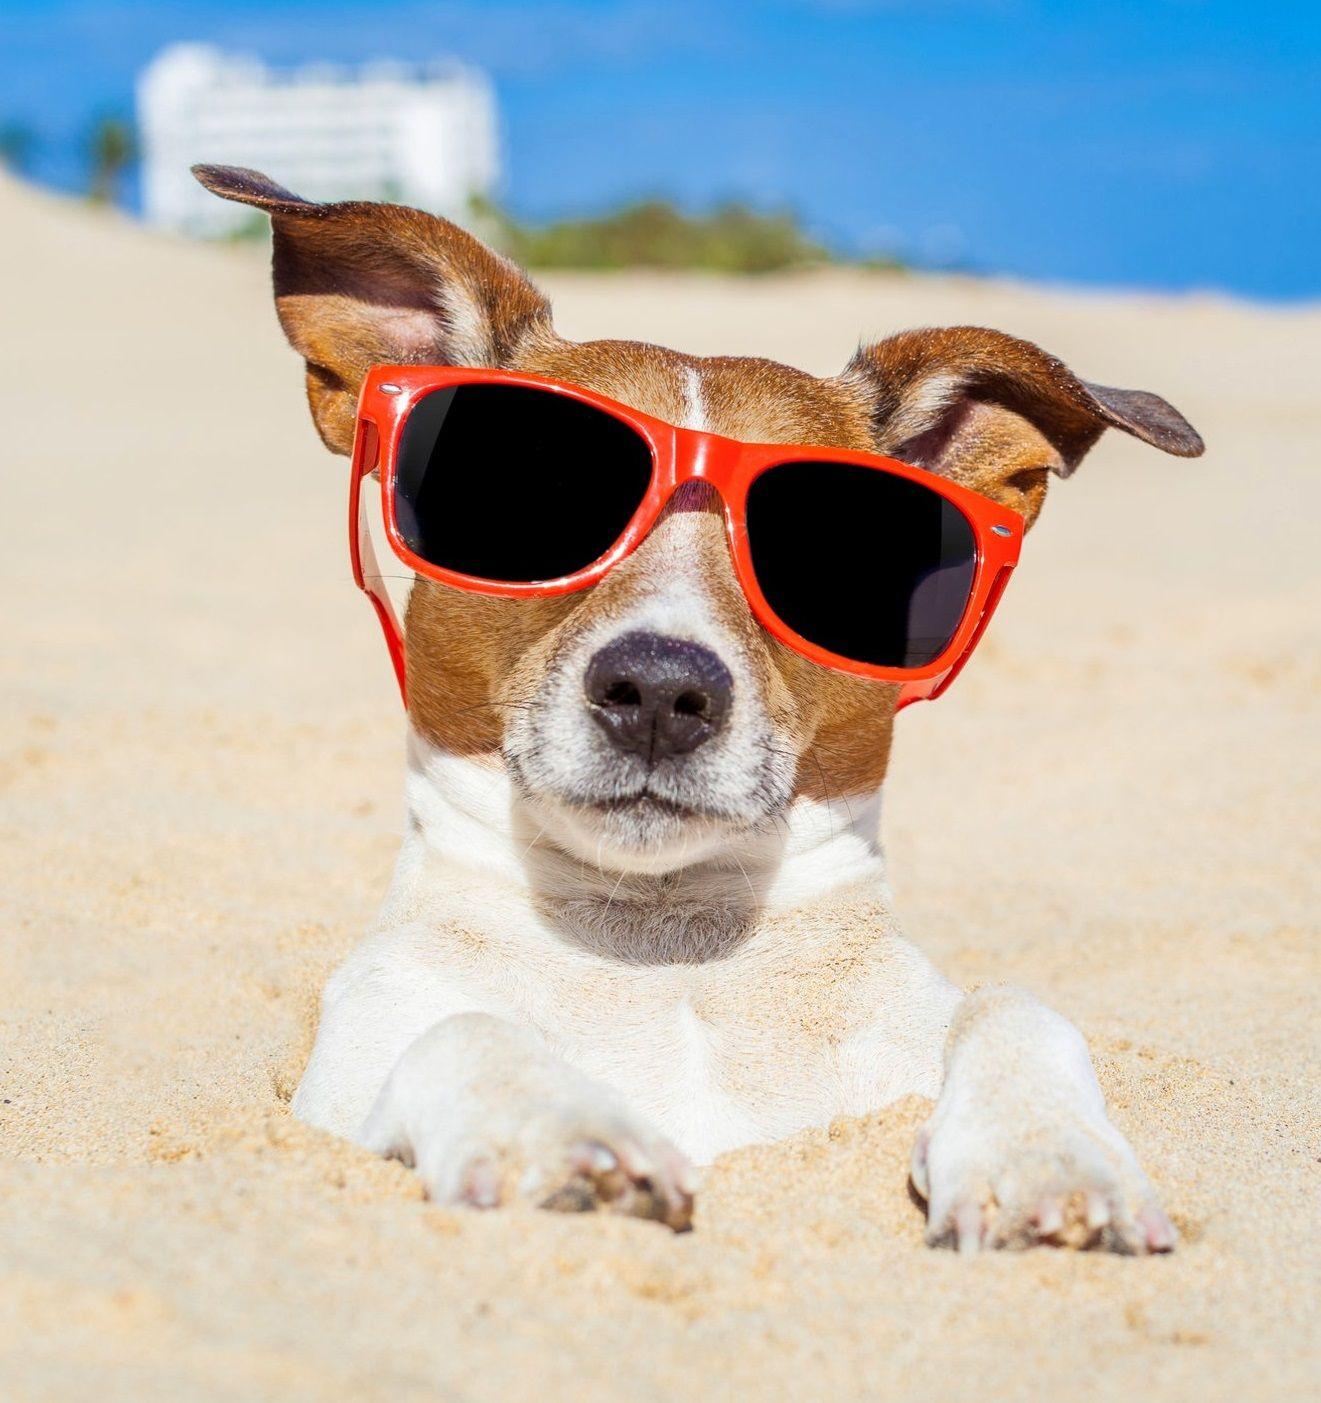 Pet Friendly Accommodations Restaurants More Jack Russell Dog Friends Dog Beach